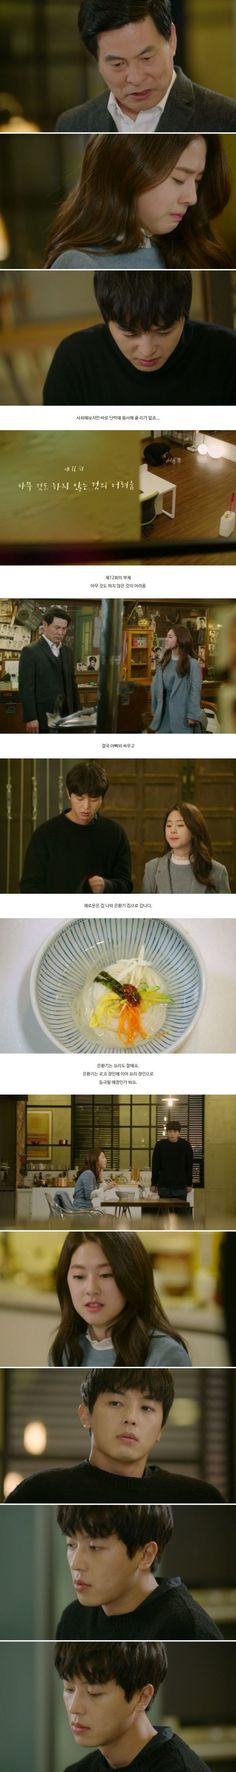 [Spoiler] Added episode 12 captures for the Korean drama 'Introvert Boss' Gong Seung Yeon, Yeon Woo Jin, Ye Ji Won, My Shy Boss, Introverted Boss, Yoon Park, Public Relations, Korean Drama, Dramas